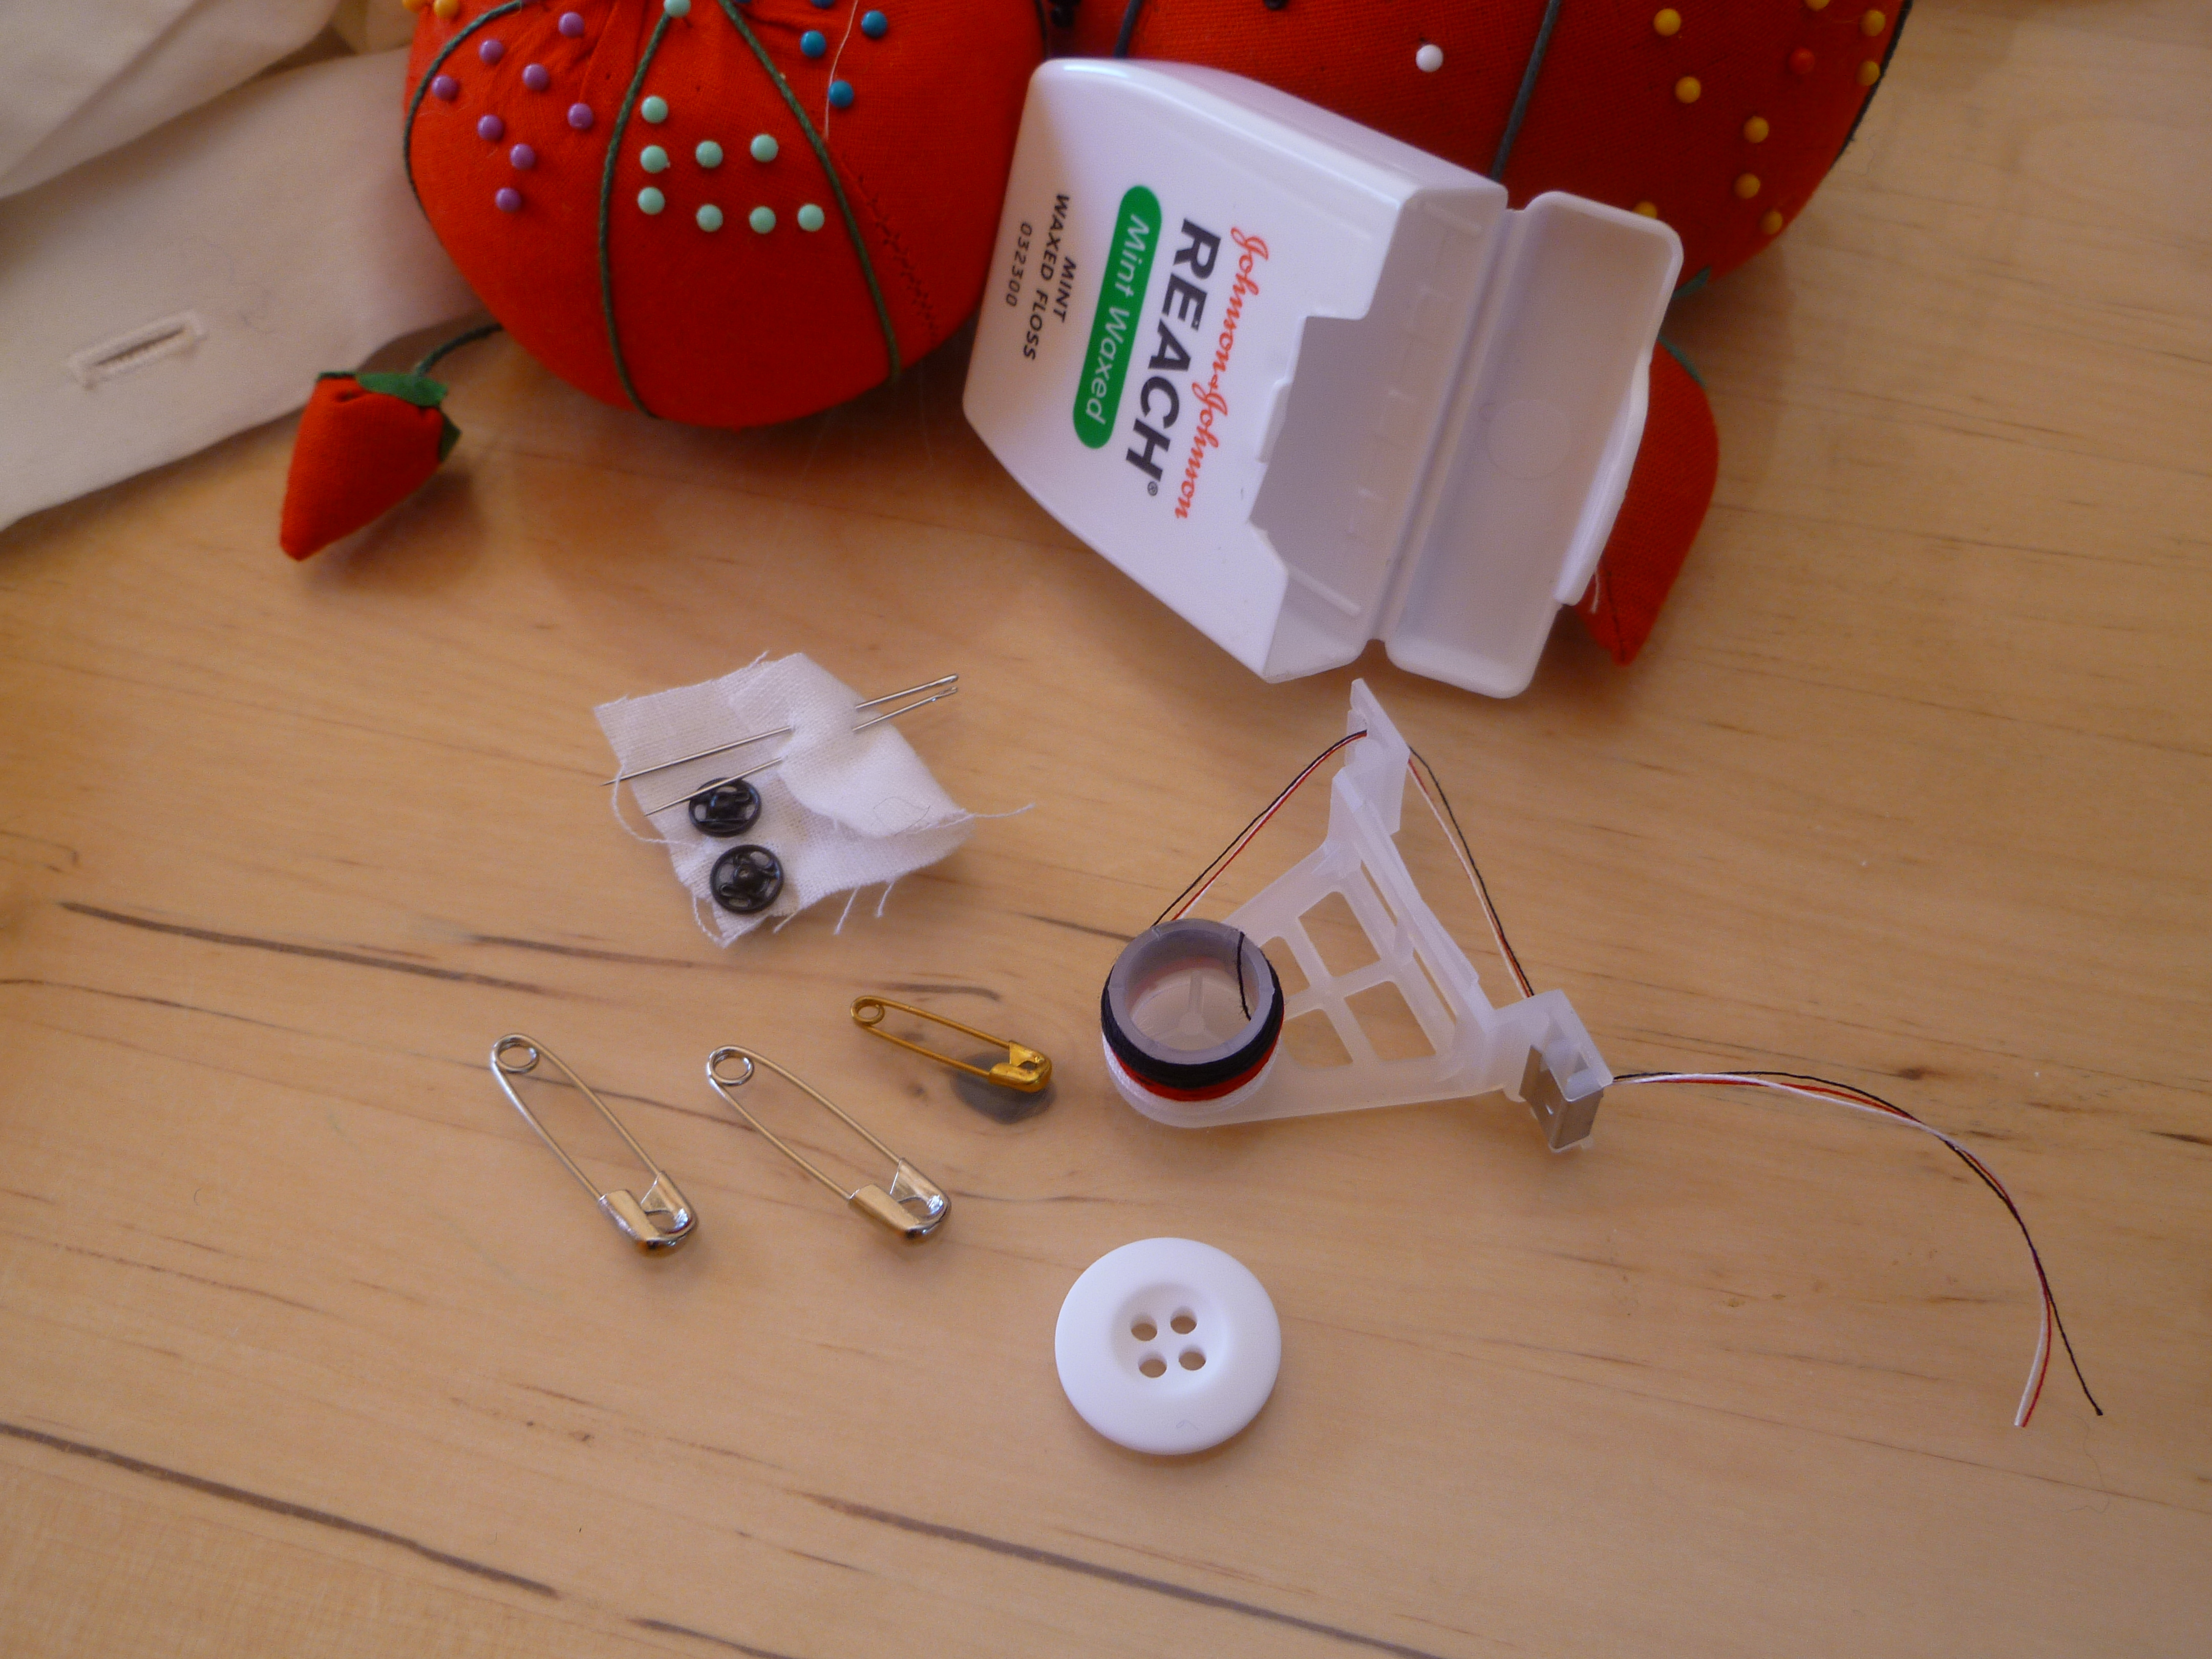 Zero waste bathroom dental floss trash backwards blog the contents of my diy dental floss box sewing kit solutioingenieria Choice Image